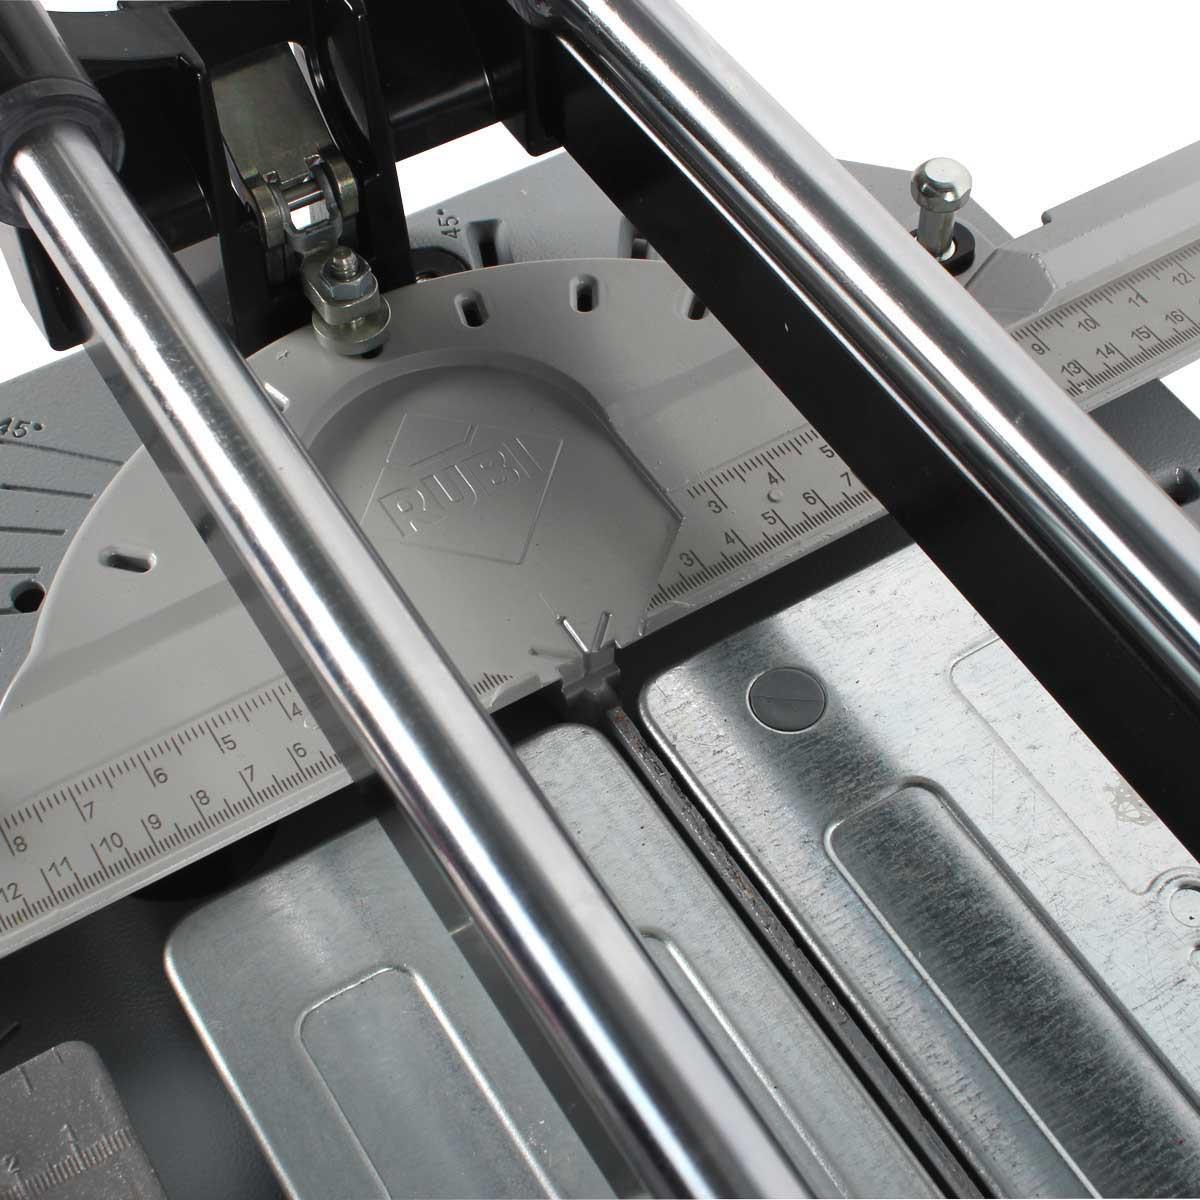 Rubi TX-N Tile Cutter ruller